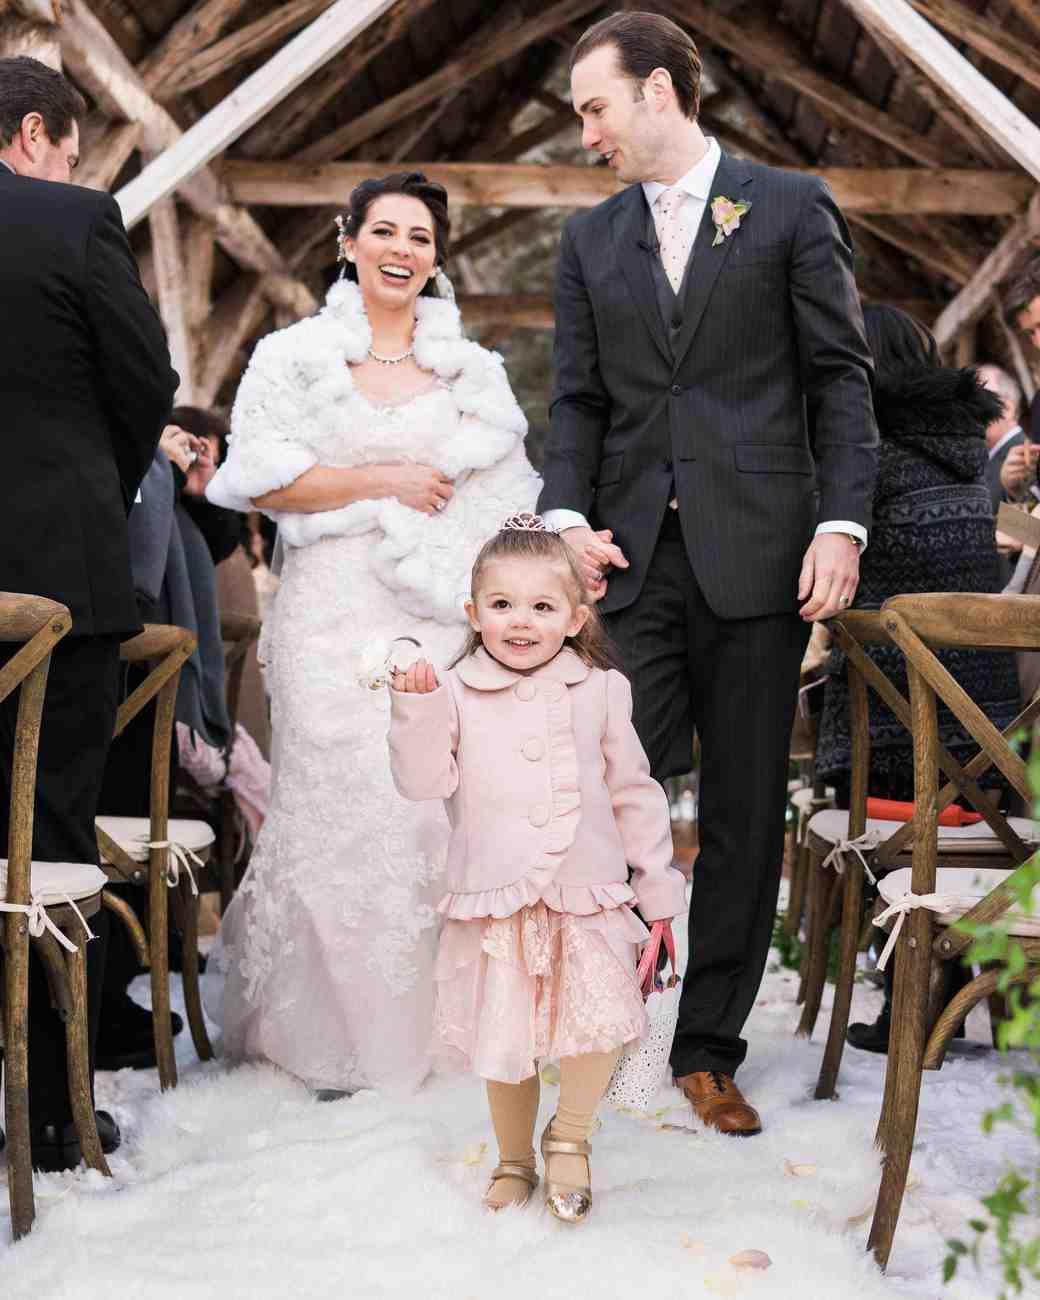 meshach-warren-wedding-recessional-0506-6134942-0716.jpg